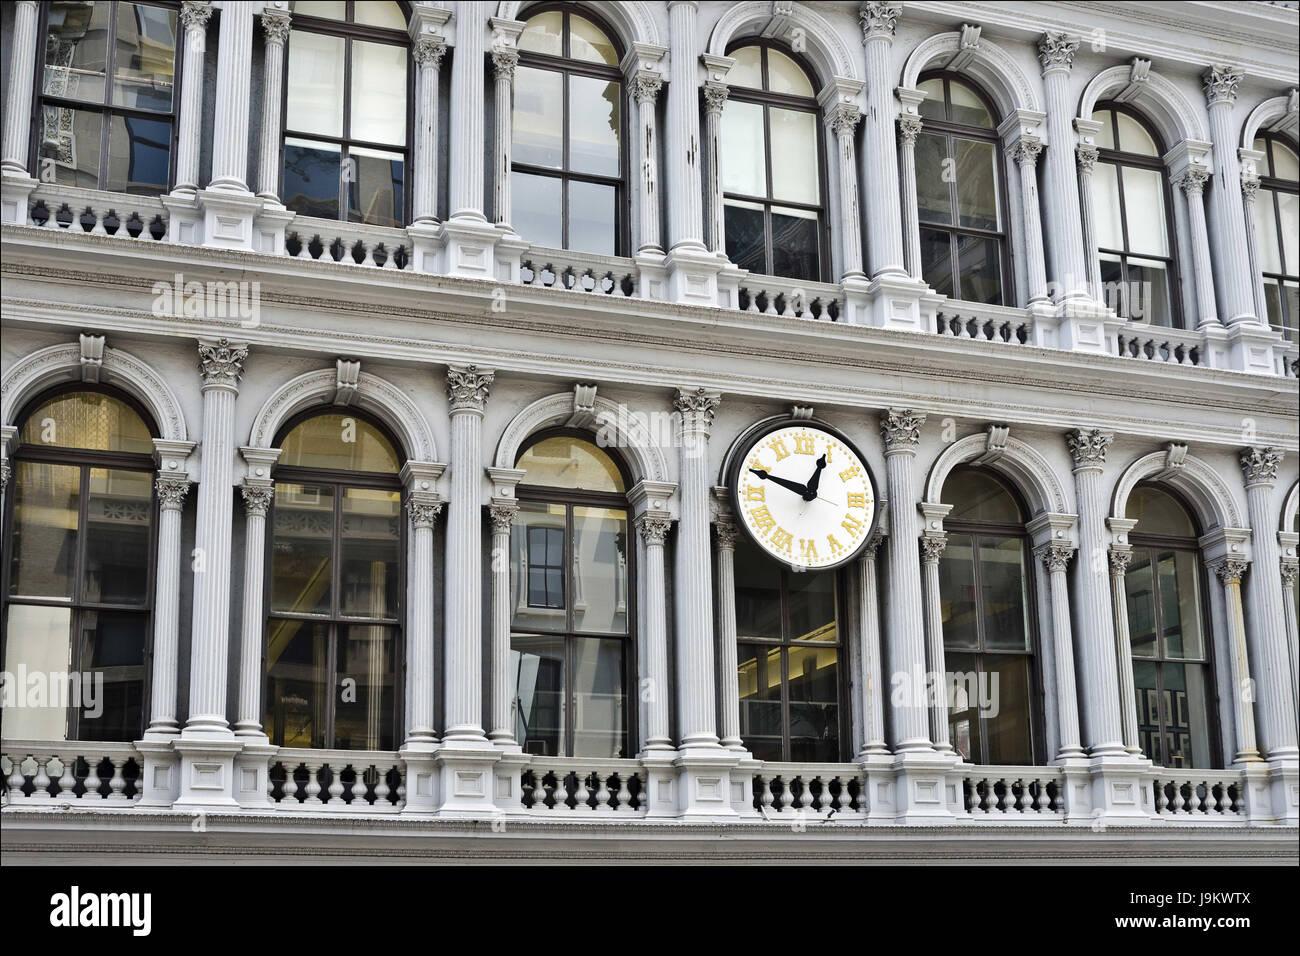 e v haughwout building, new york, usa - Stock Image